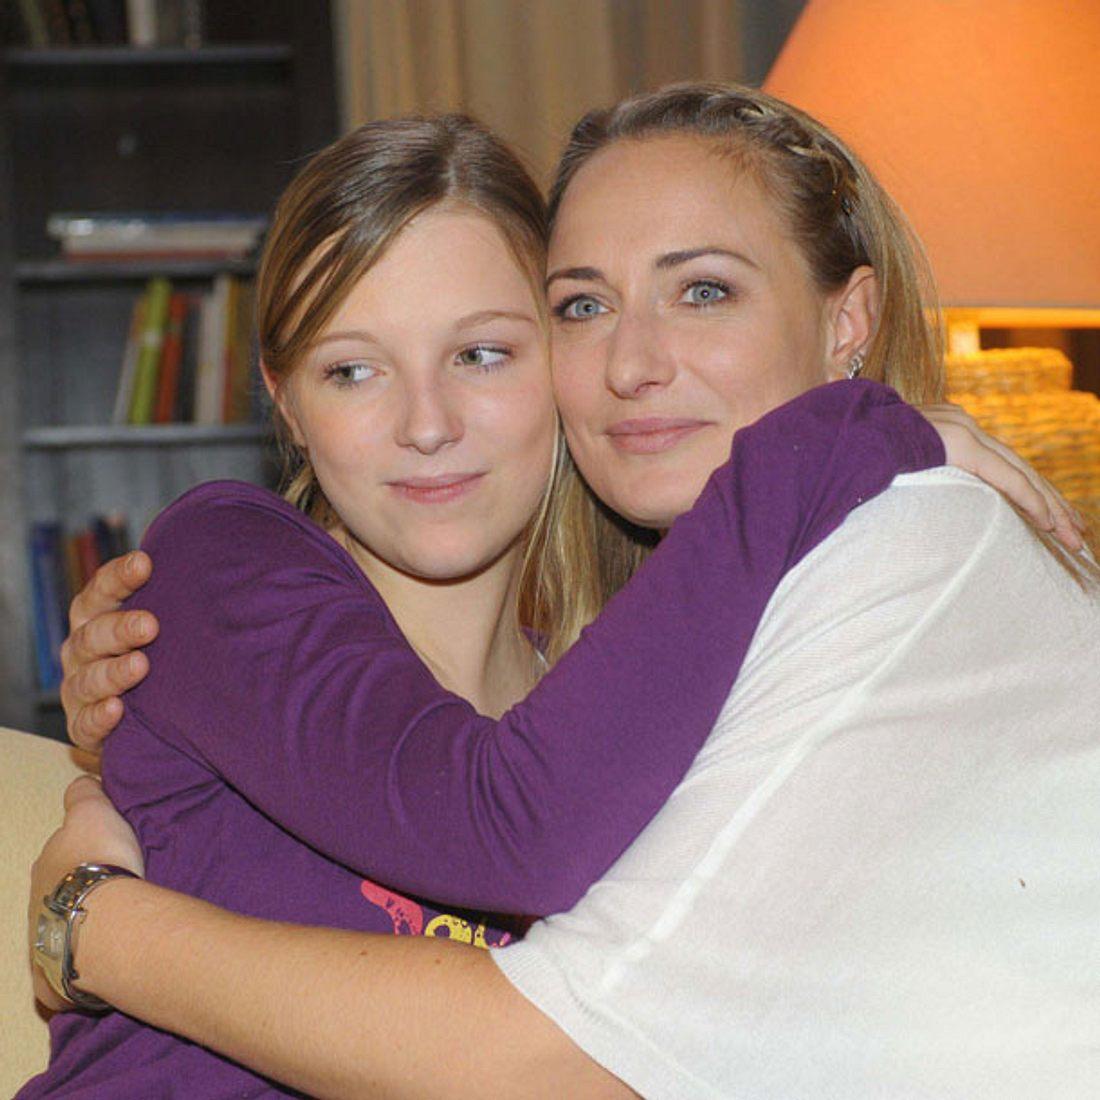 Iris Mareik Steen und Eva Mona Rodekirchen